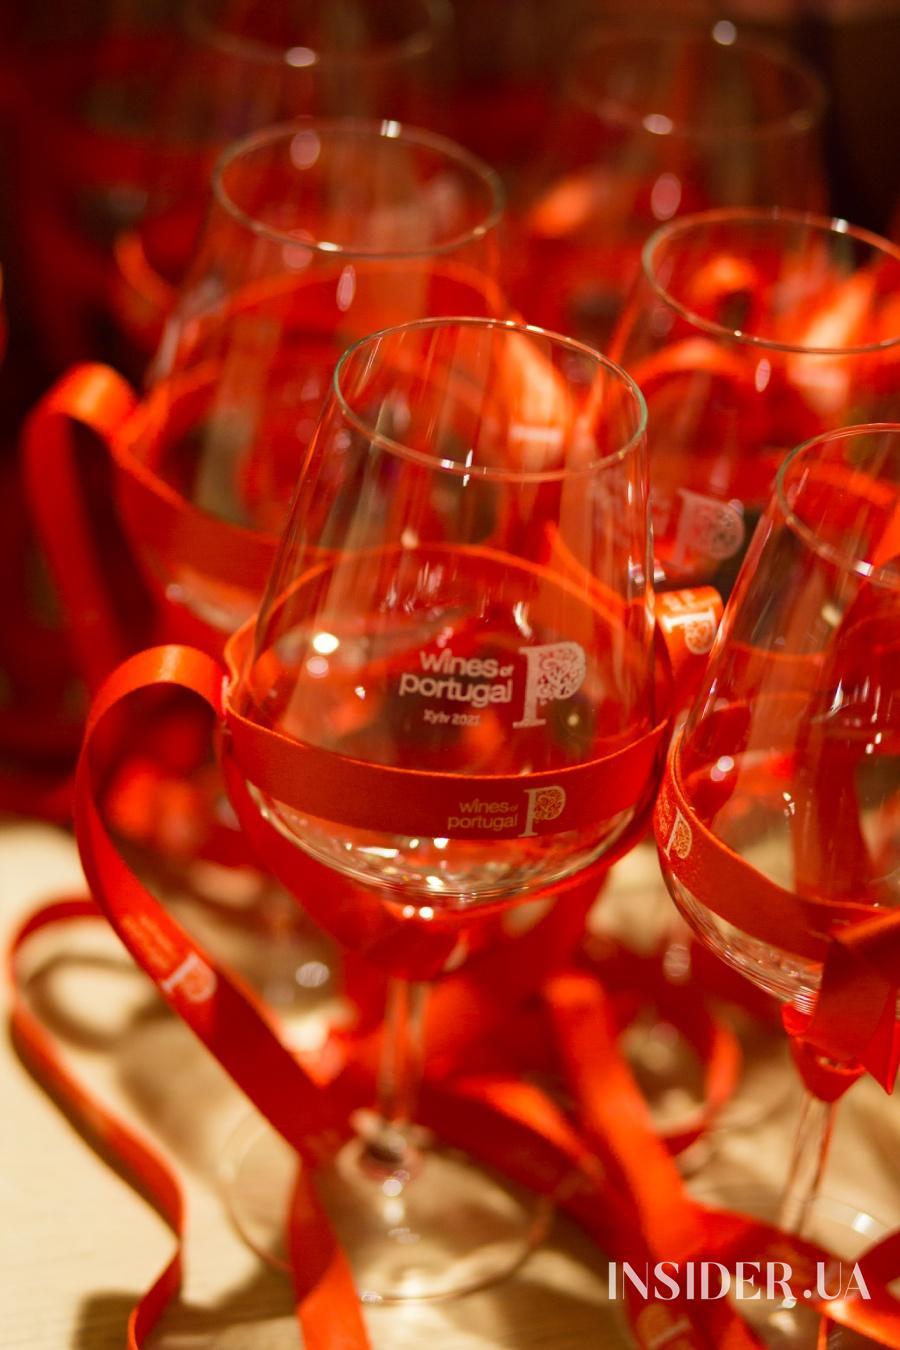 Винная дипломатия: в Киеве провели Wines of Portugal Grand Tasting 2021